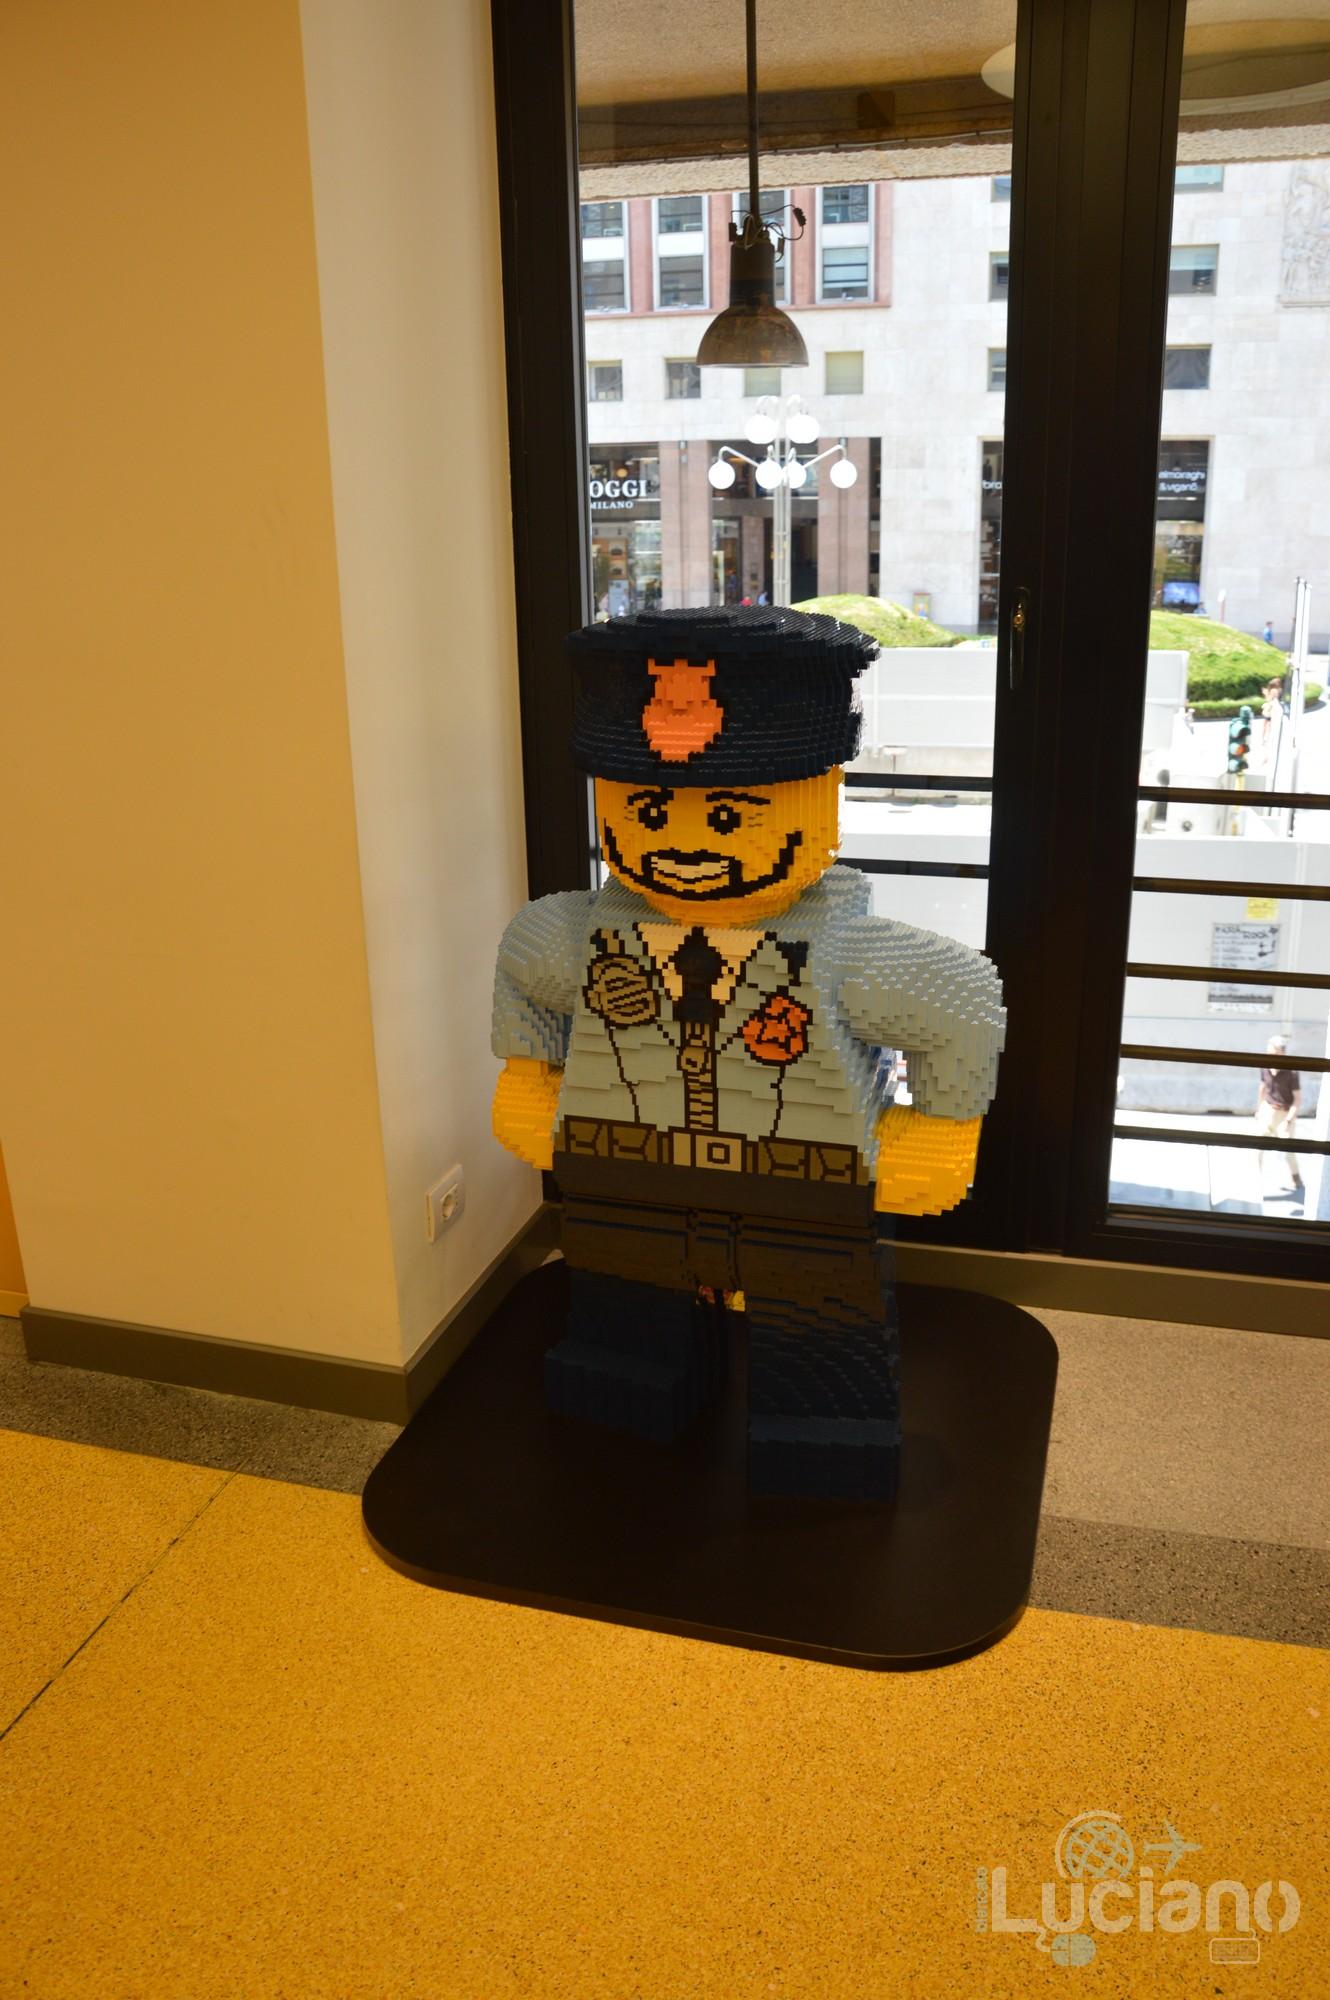 Lego Store - Modellino POLICY MAN - Milano - Lombardia - Italia